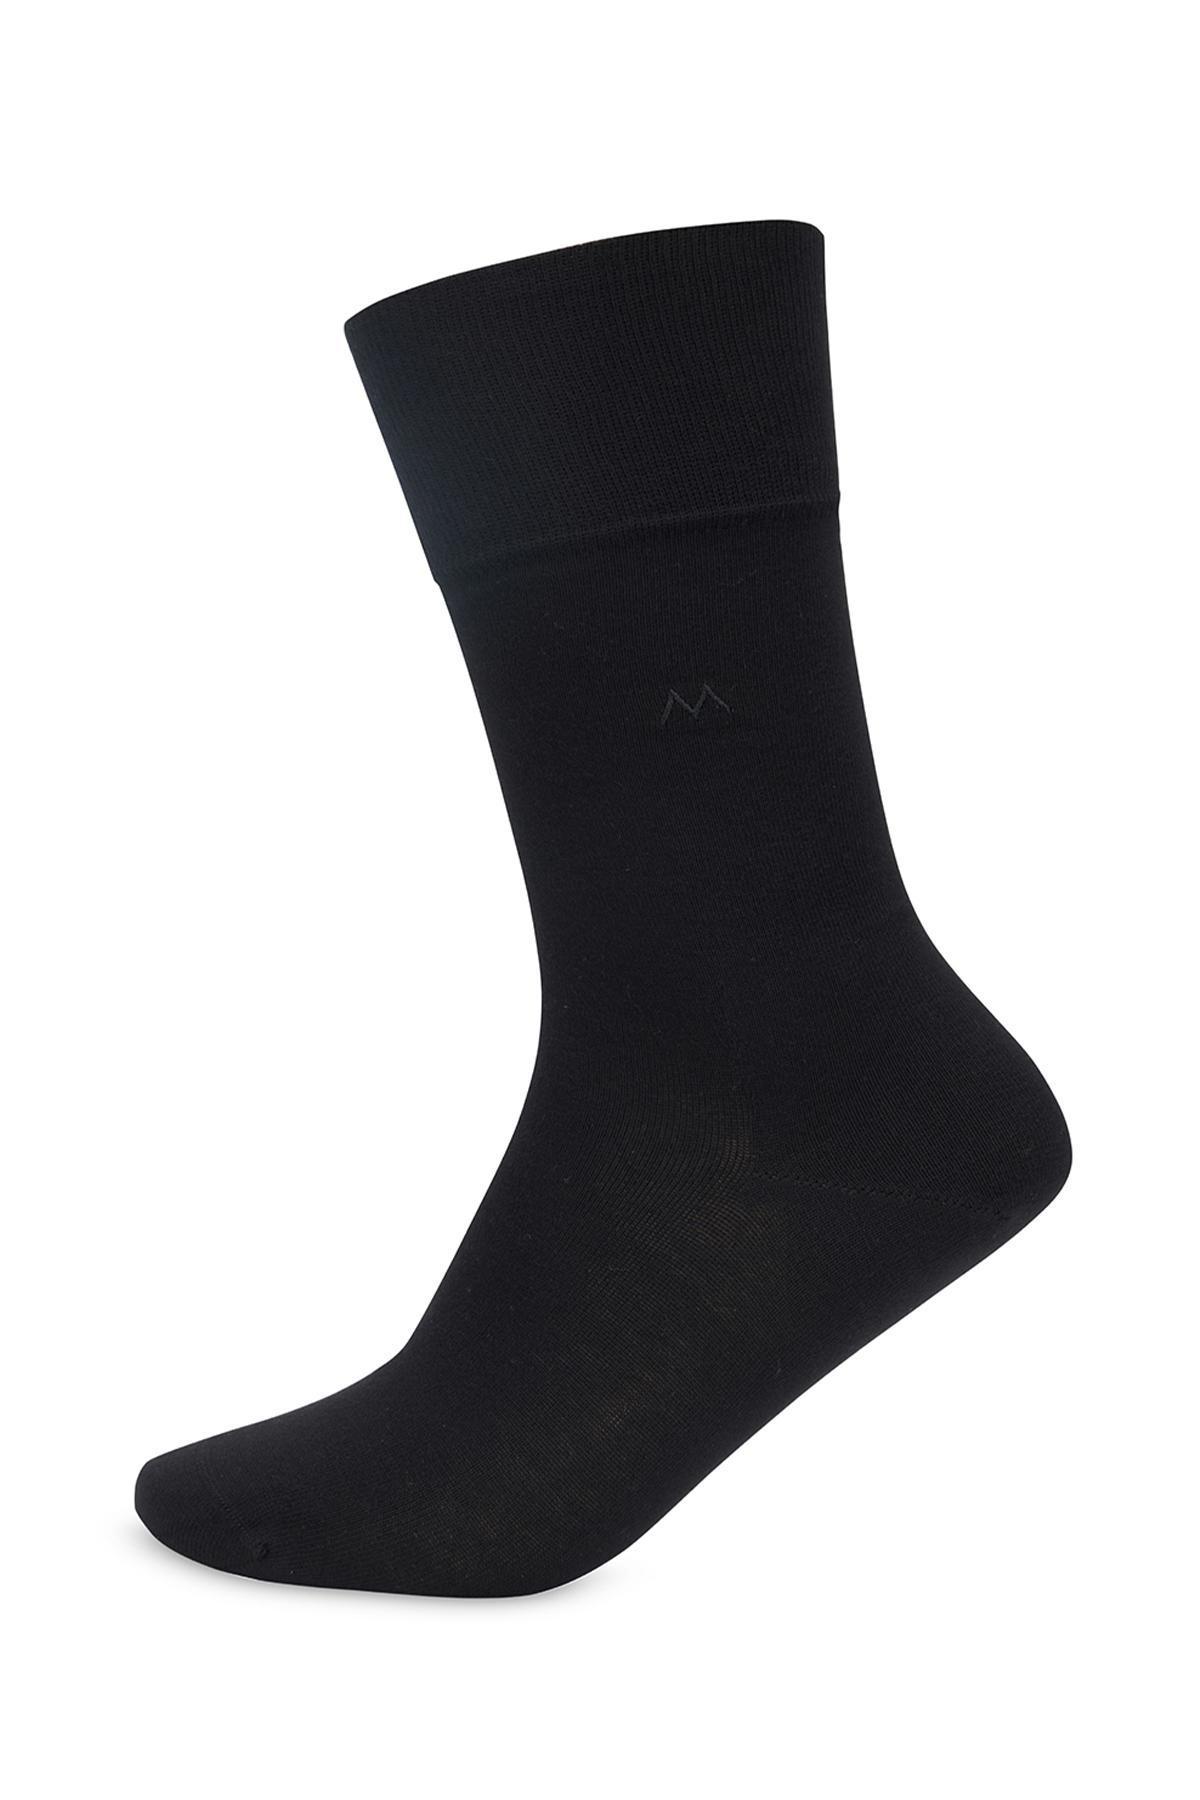 Pamuklu Siyah Yazlık Çorap